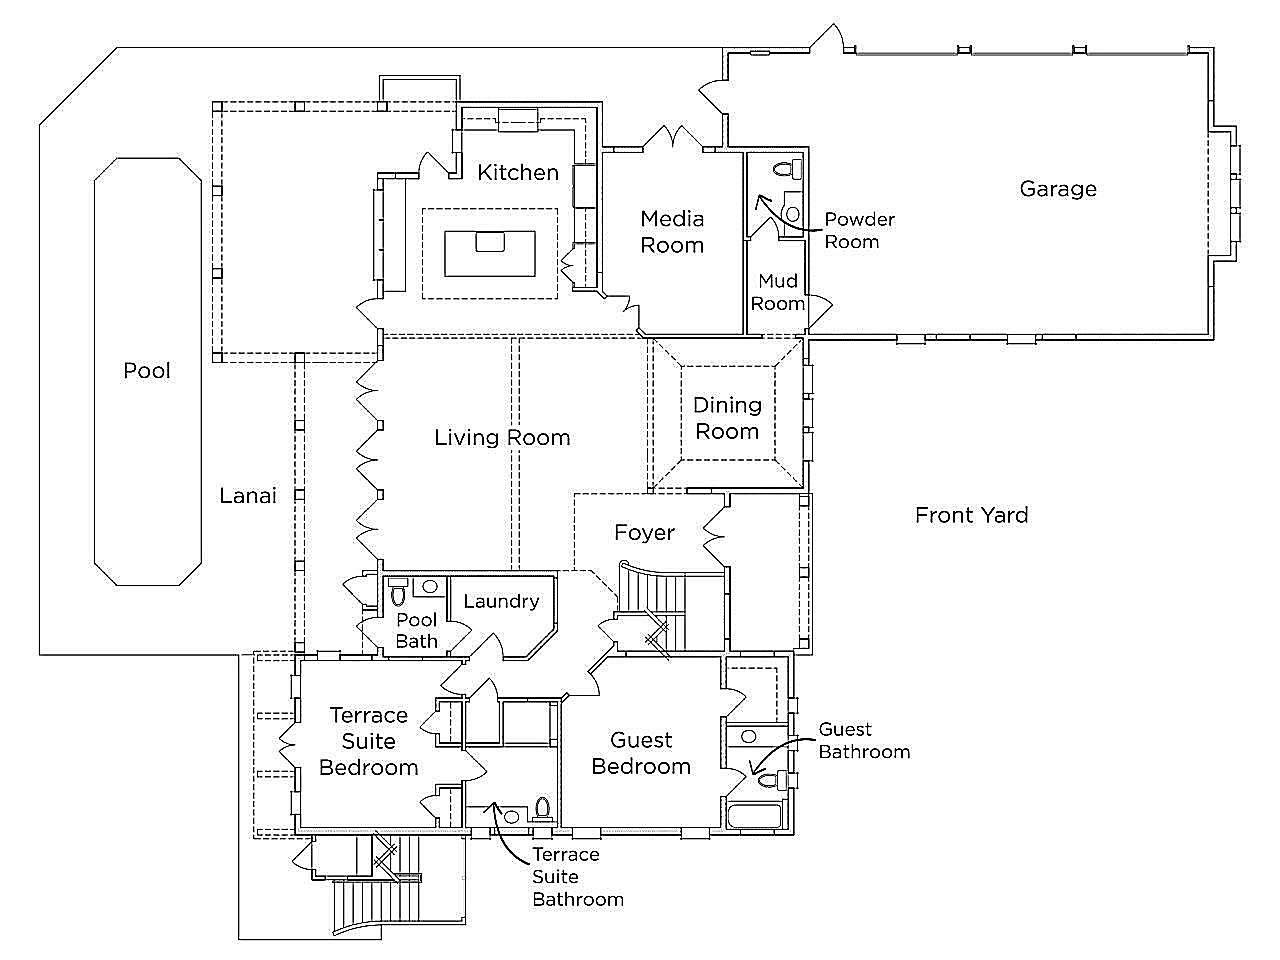 Floor Plan of the 2016 Dream Home